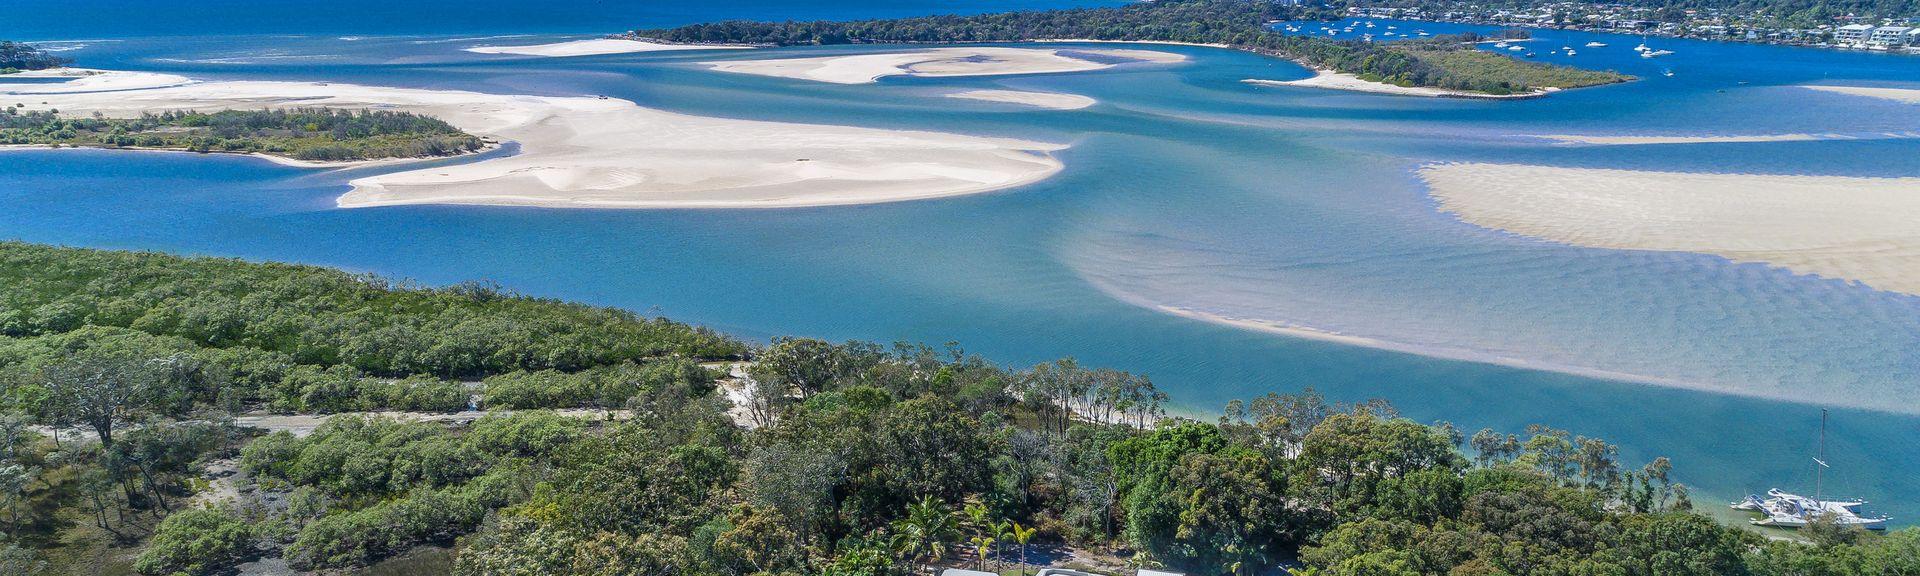 Jardins botaniques de Noosa, Lake Macdonald, Queensland, Australie